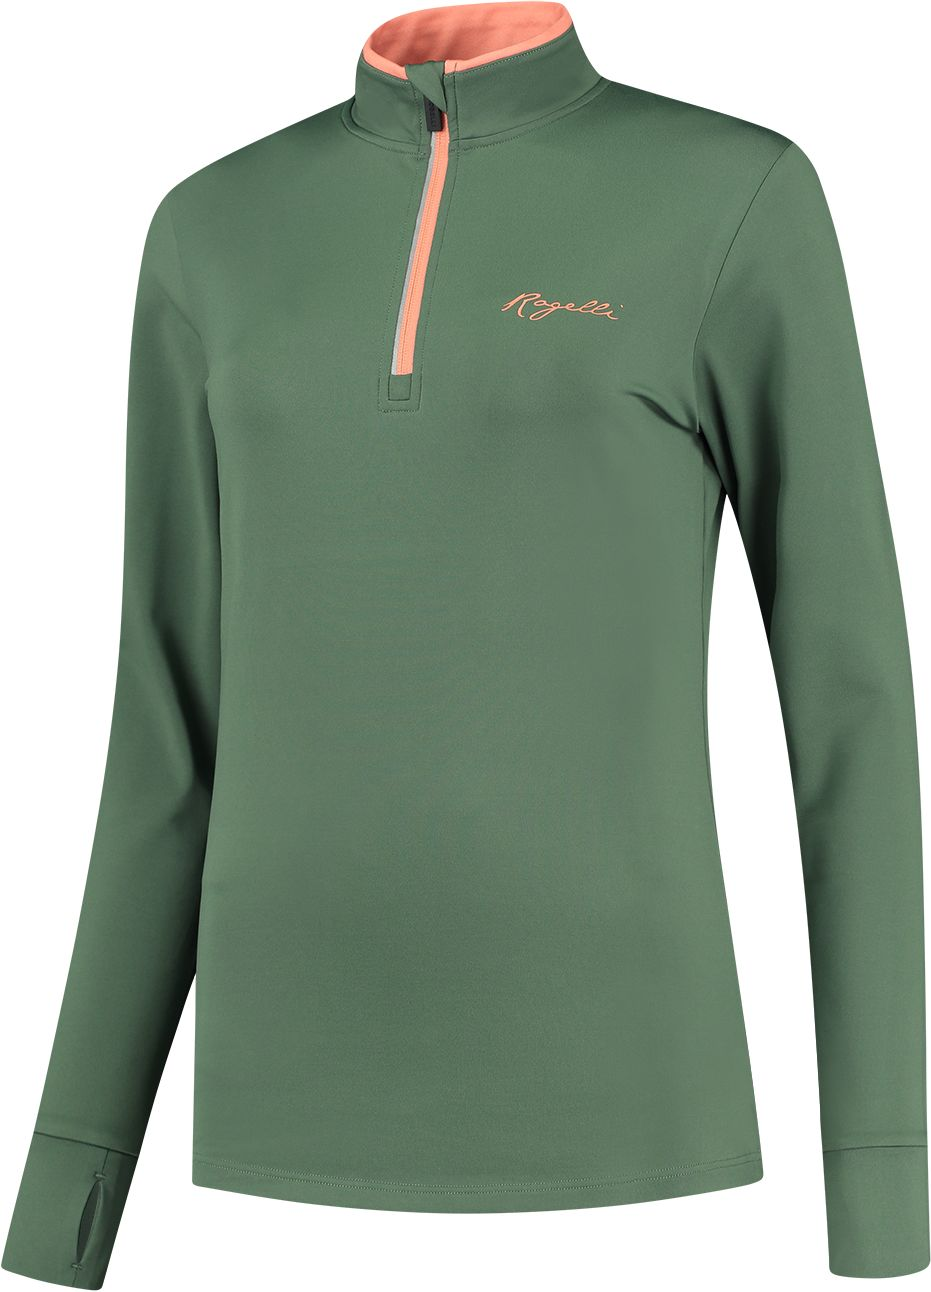 ROGELLI bluza do biegania damska SNAKE green ROG351110 Rozmiar: S,ROG351110.XS